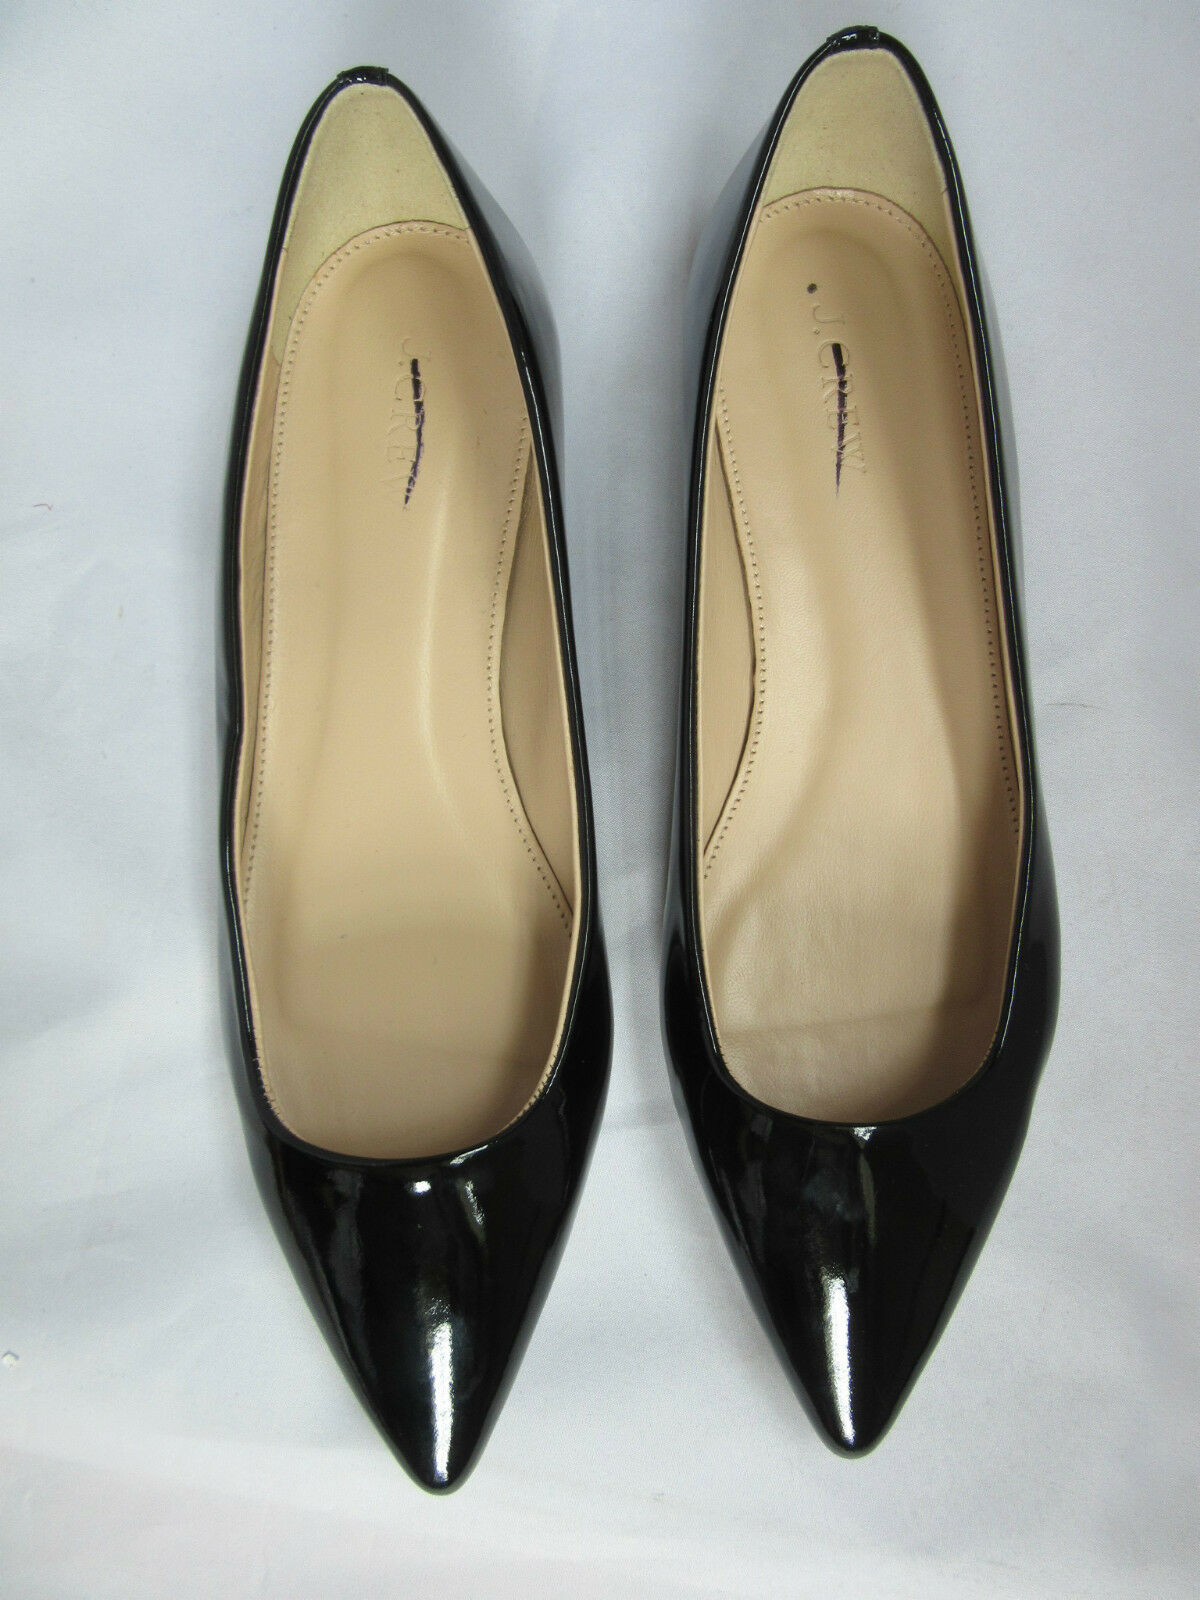 J Crew Harper nero Patent Leather Flats Dimensione 6.5  138  Style B1791 NWOB